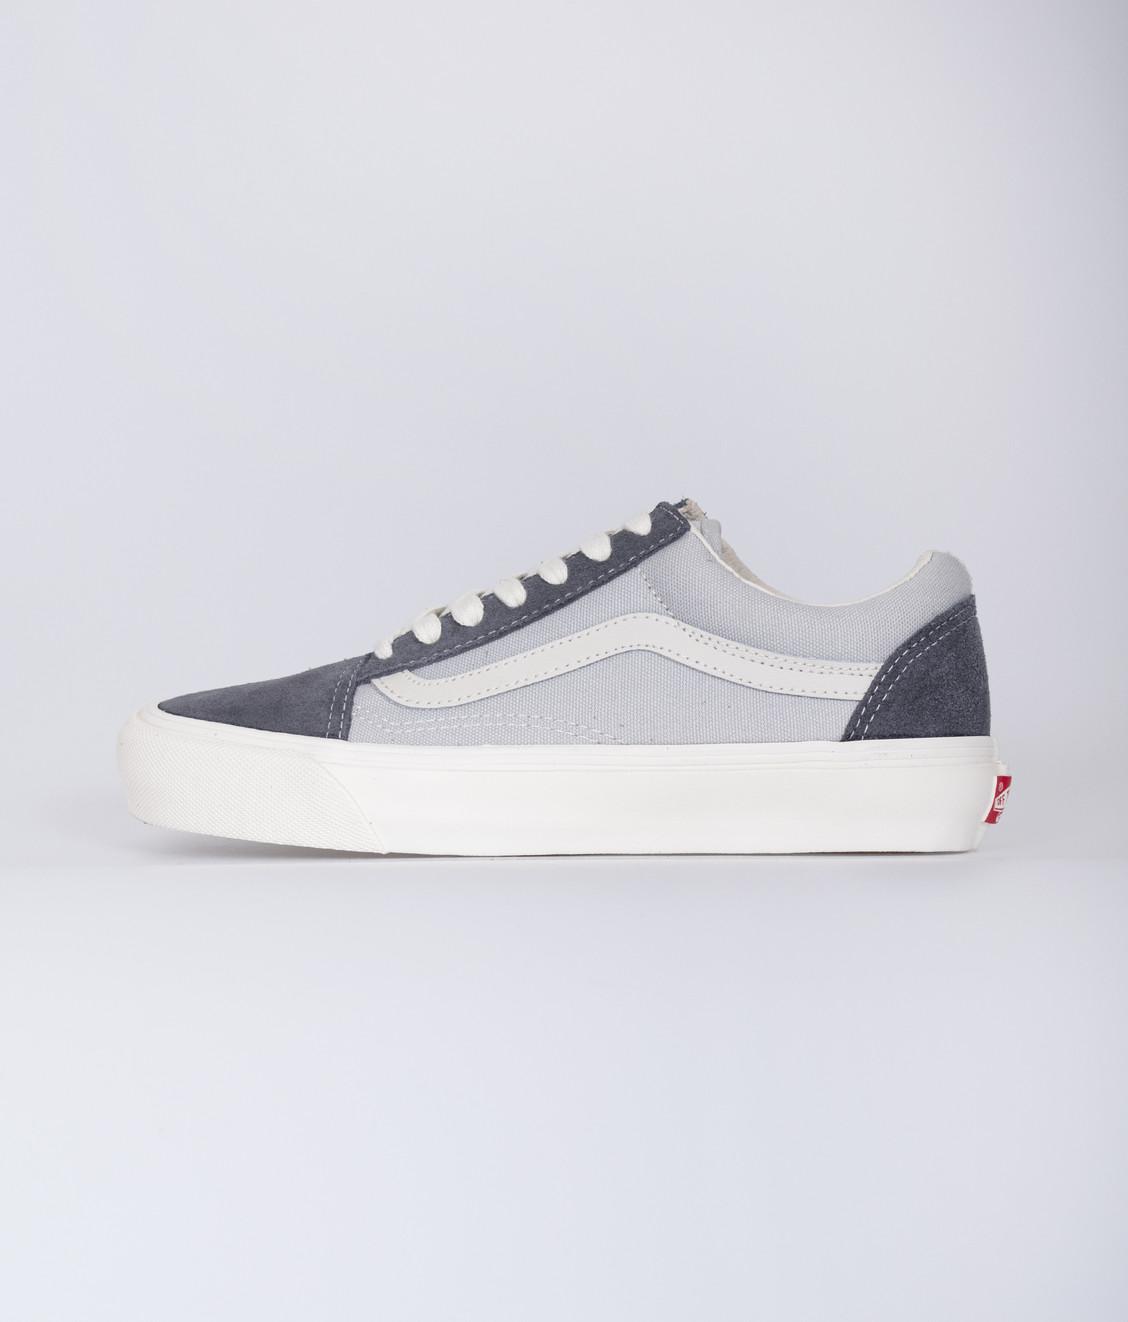 Vans Vault Old Skool OG LX Light Grey Maha Amsterdam